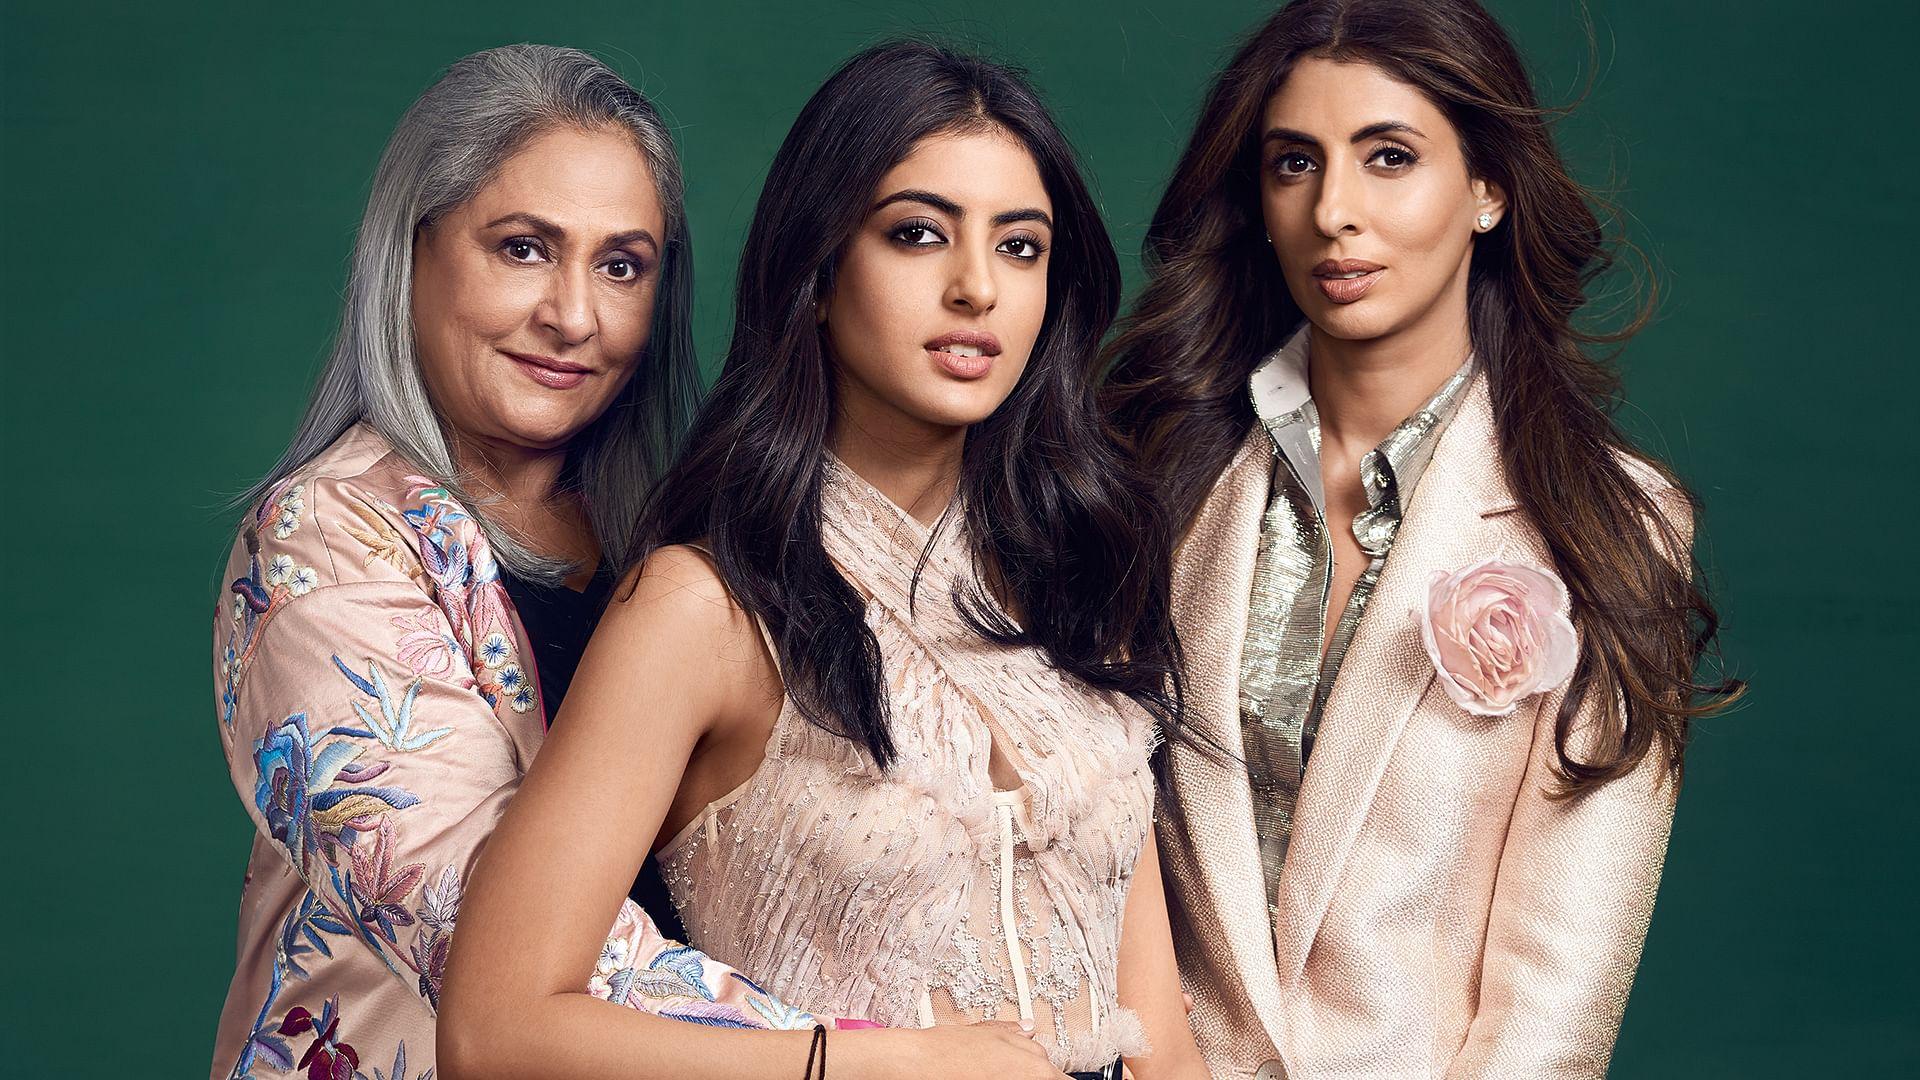 Bachchans Share Emotional Messages as Navya Naveli Nanda Turns 21